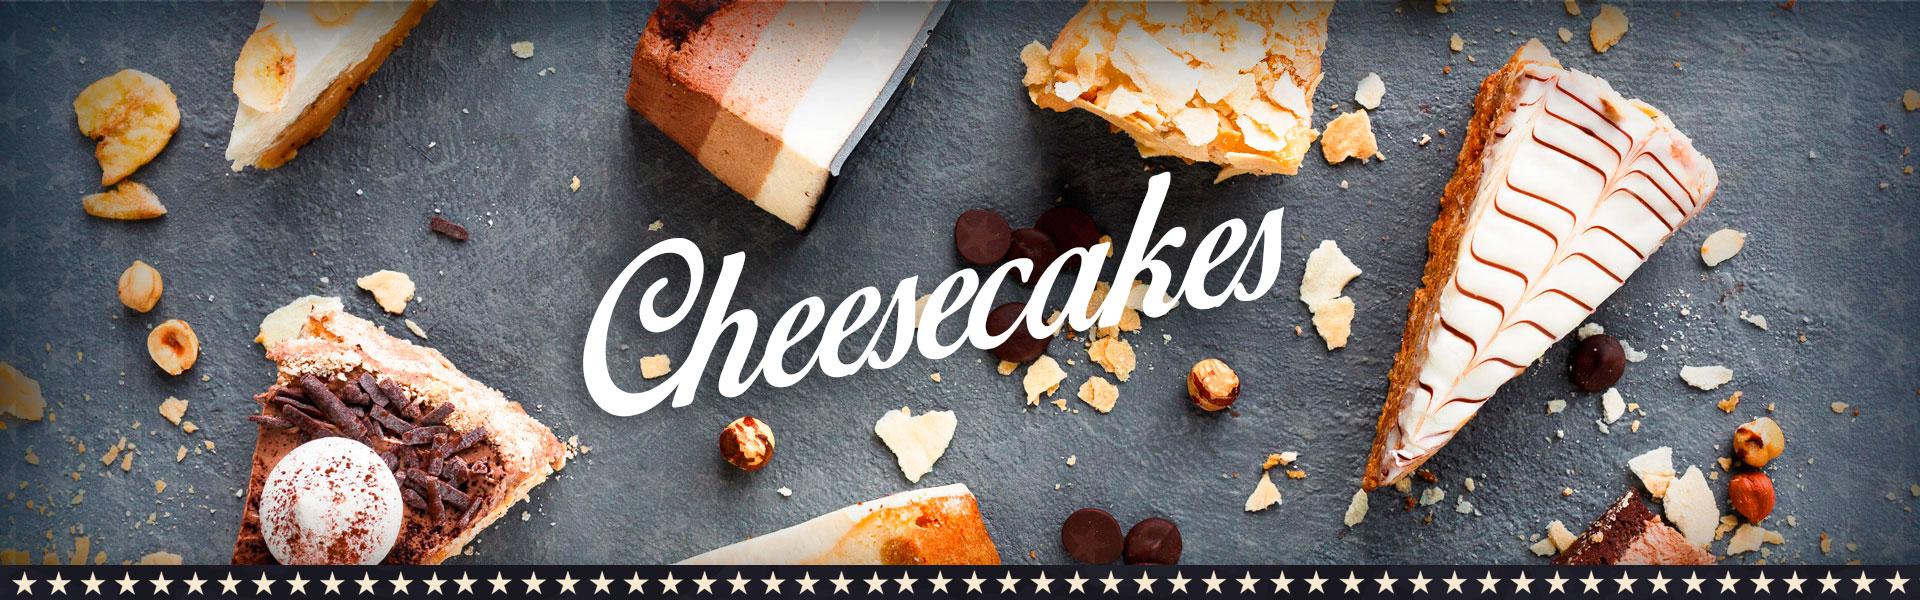 Header_cheesecake